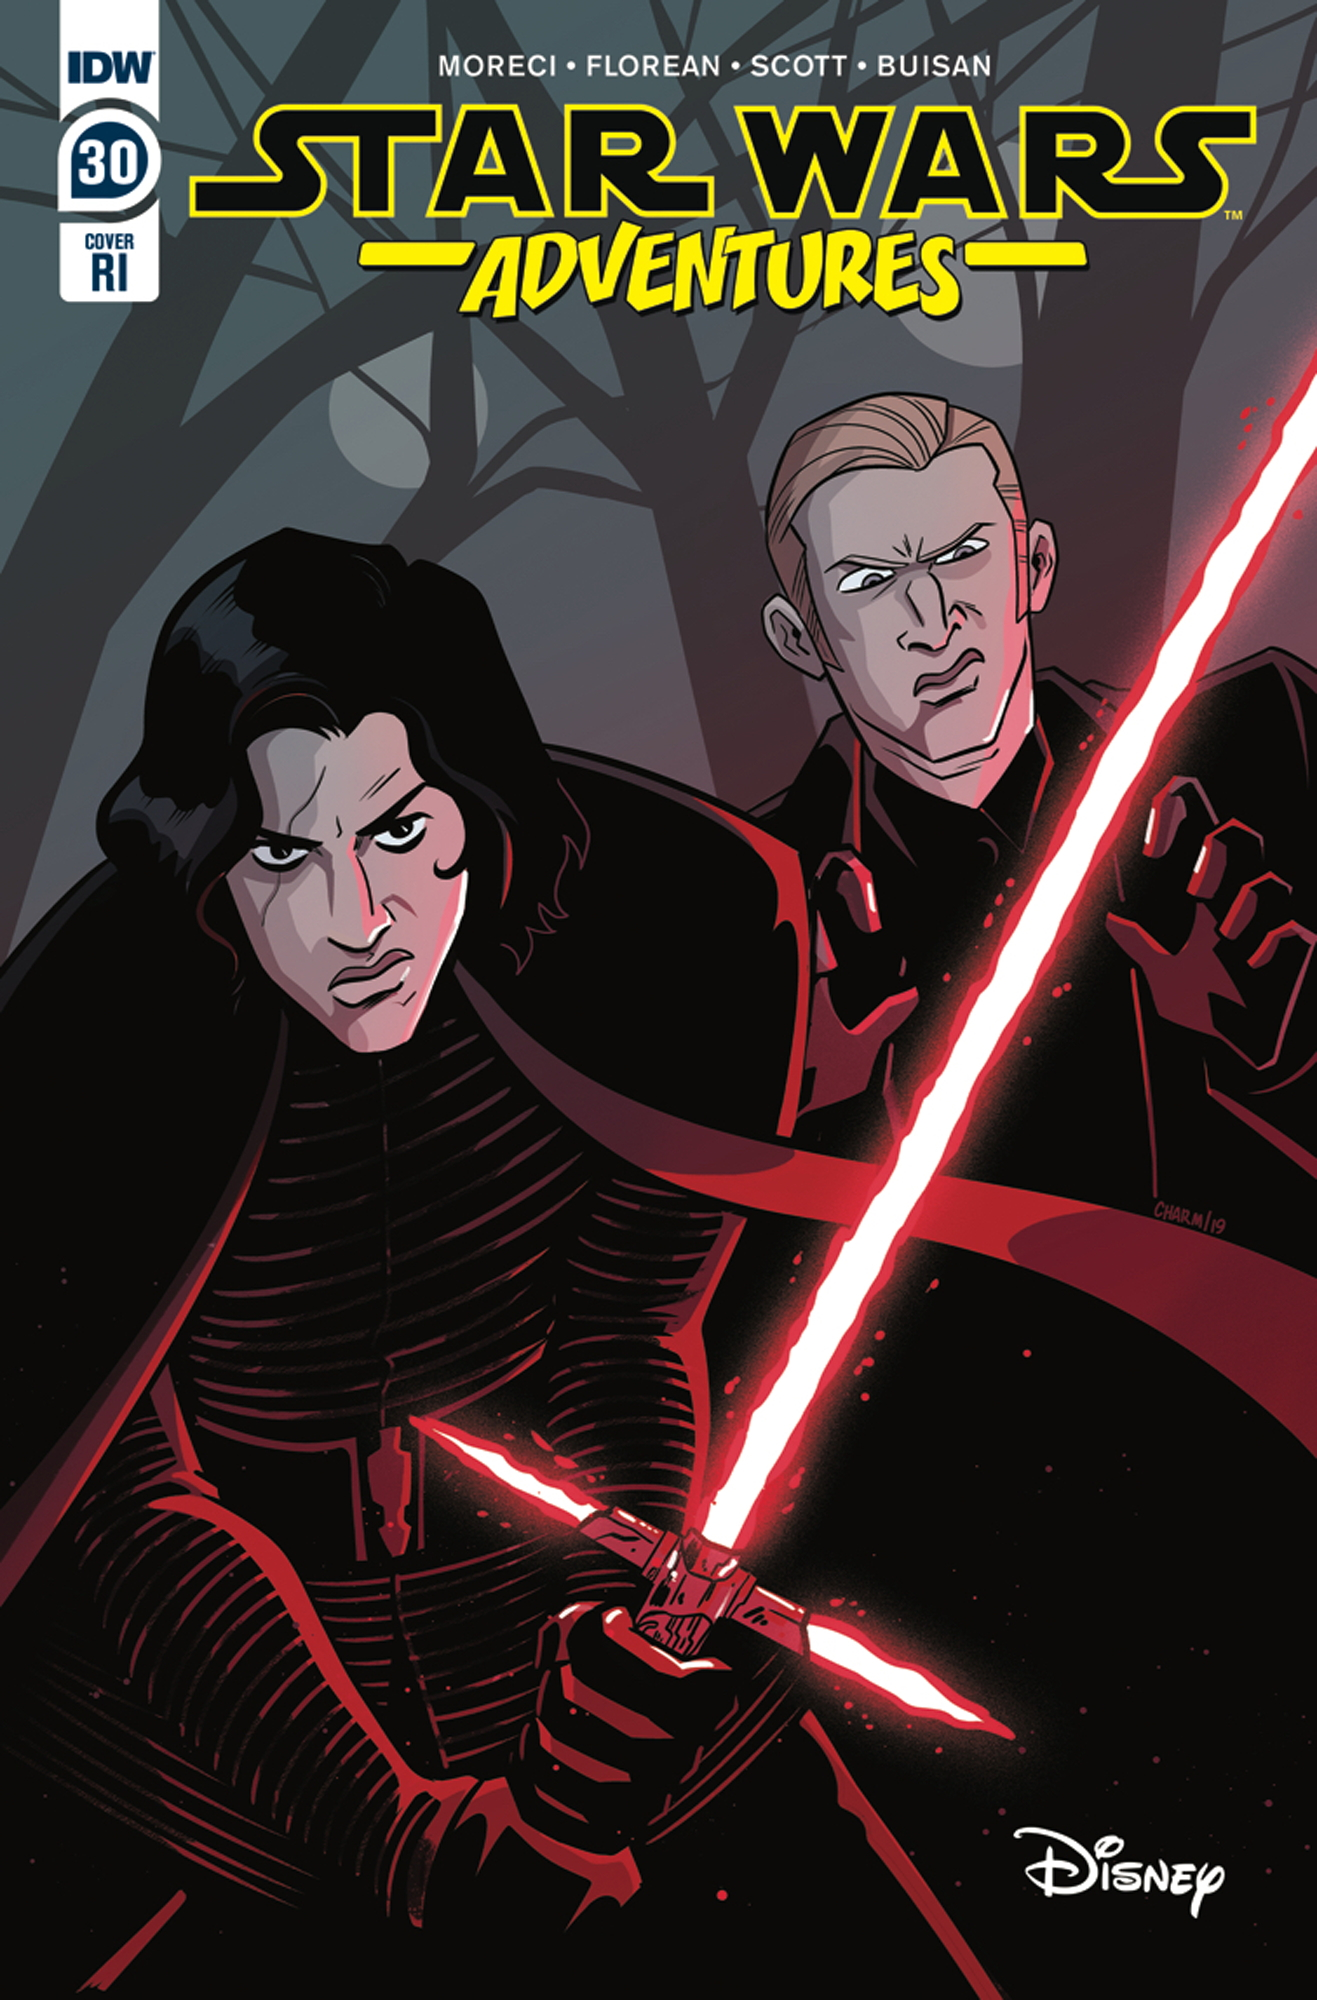 Star Wars Adventures #30 (Derek Charm Variant Cover) (15.01.2020)